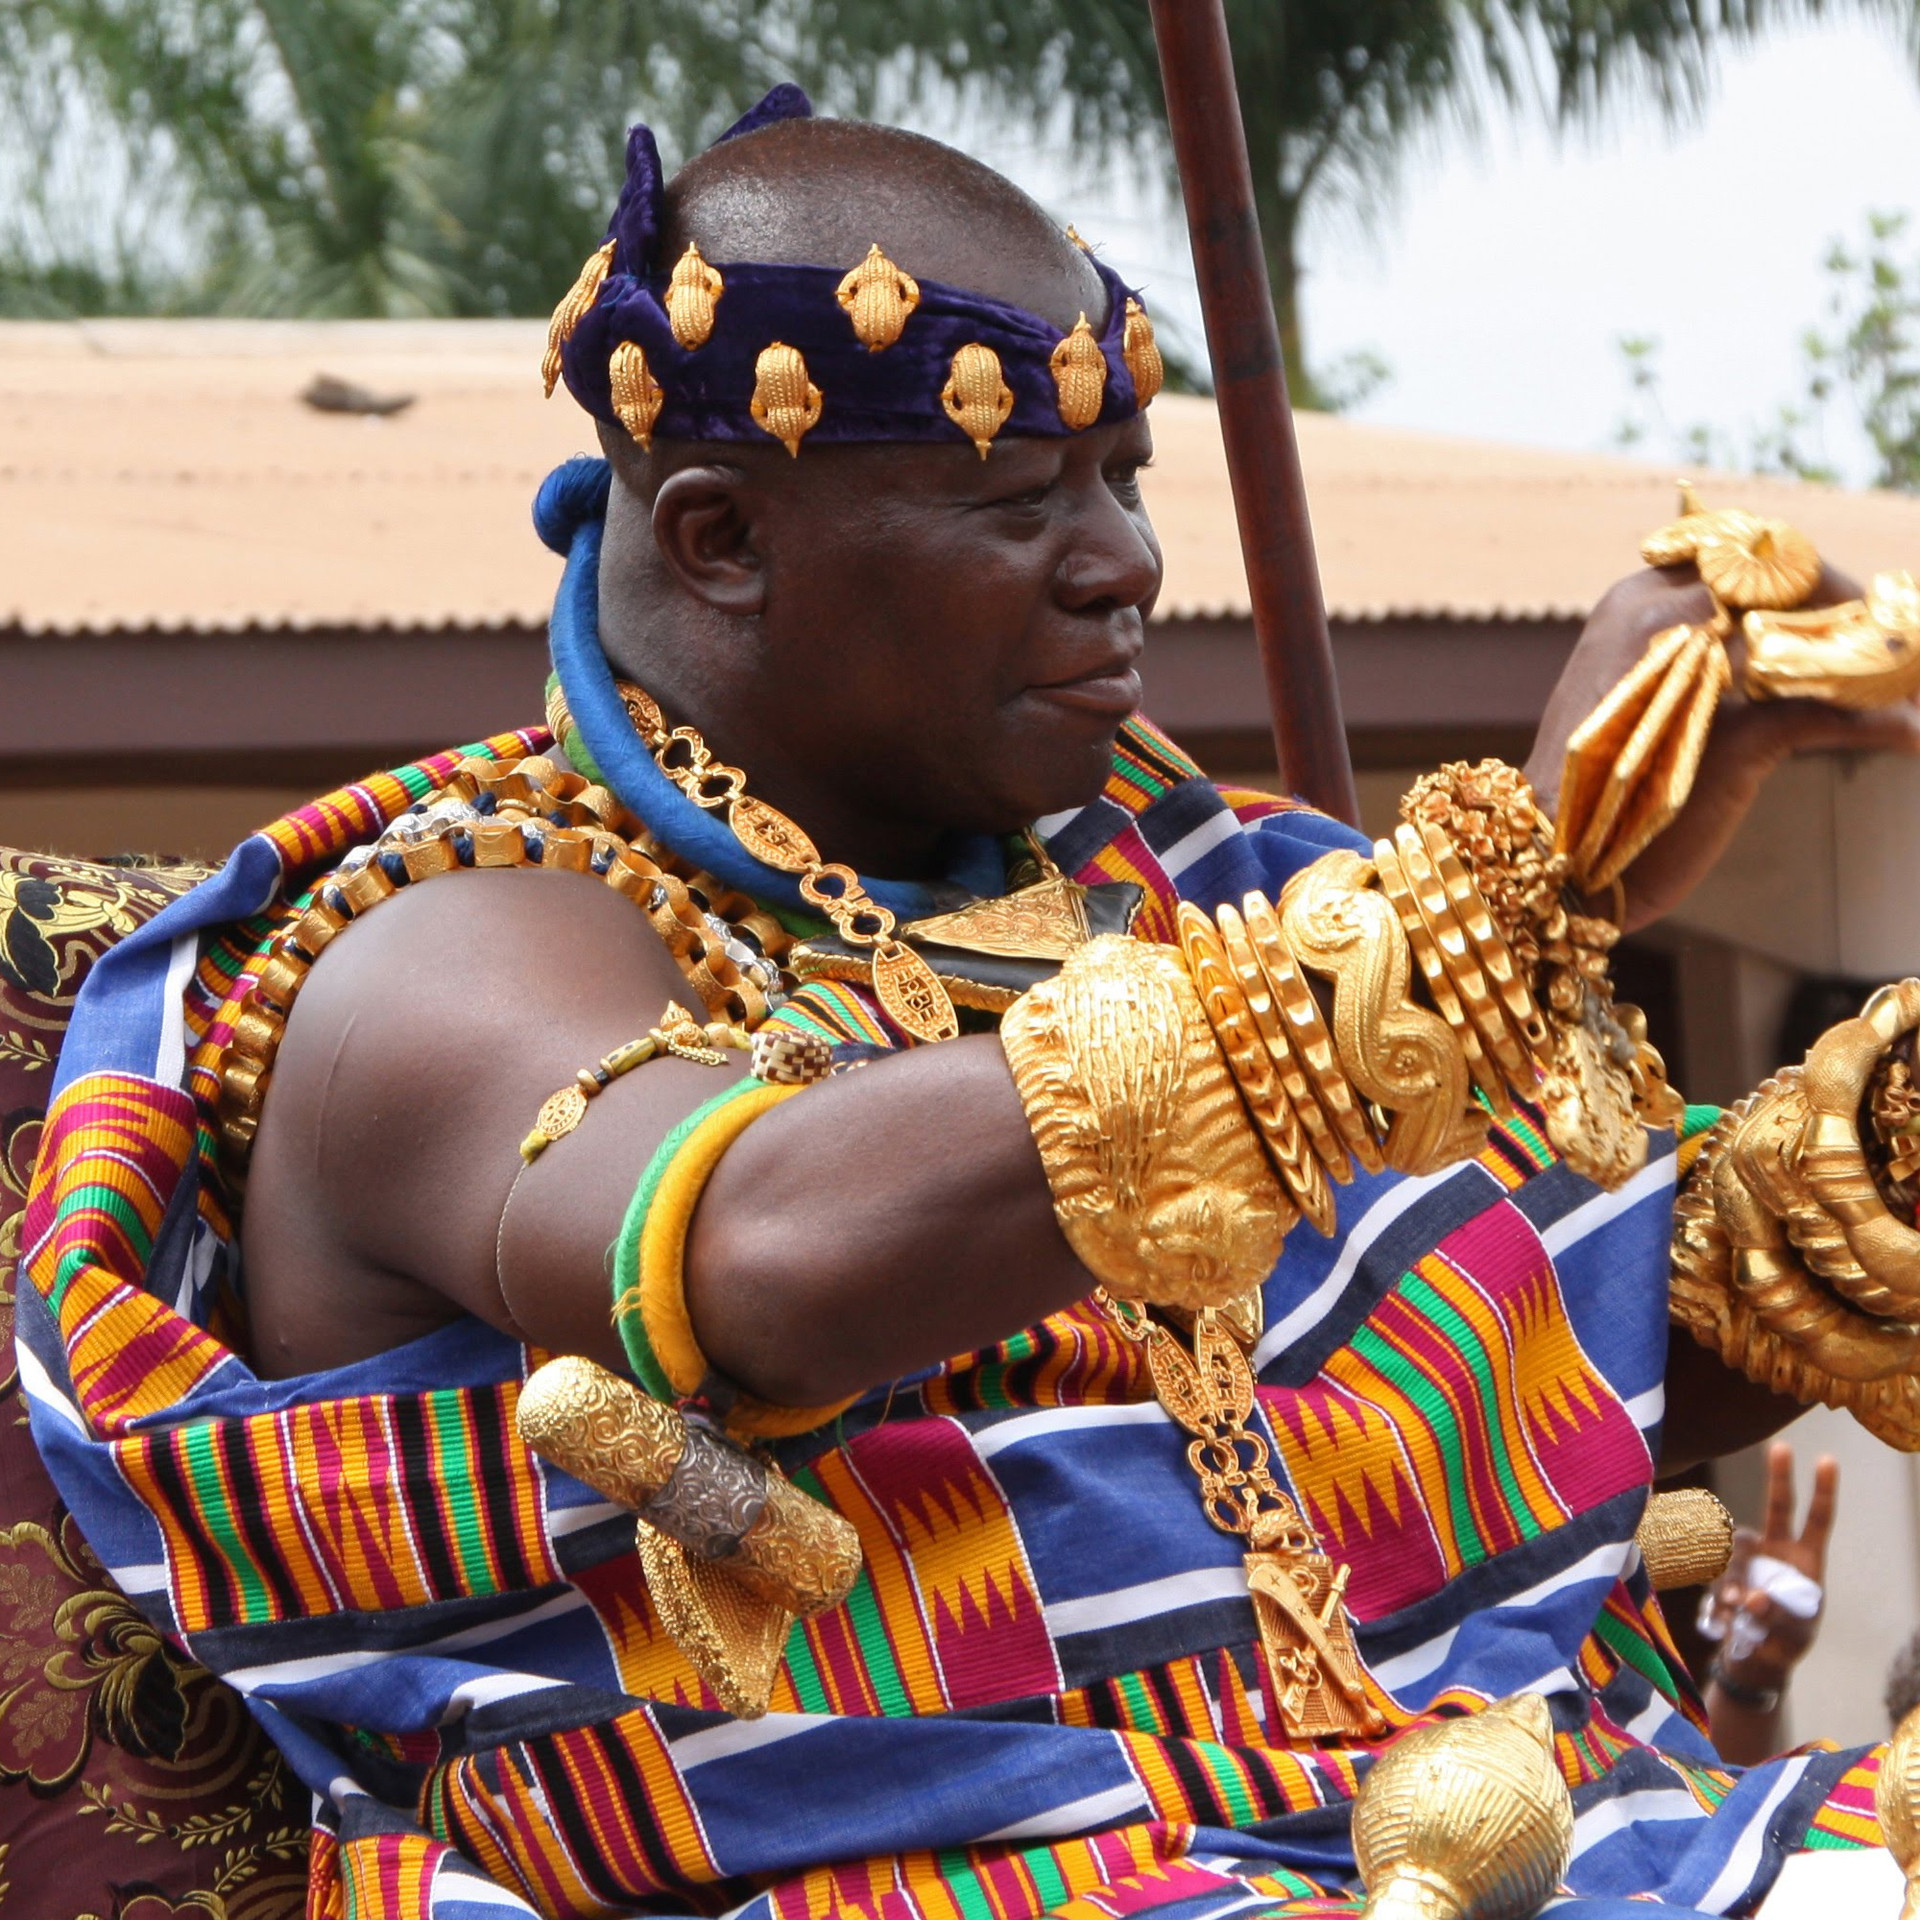 His Royal Majesty Otumfuo Osei Tutu II, Asantehene